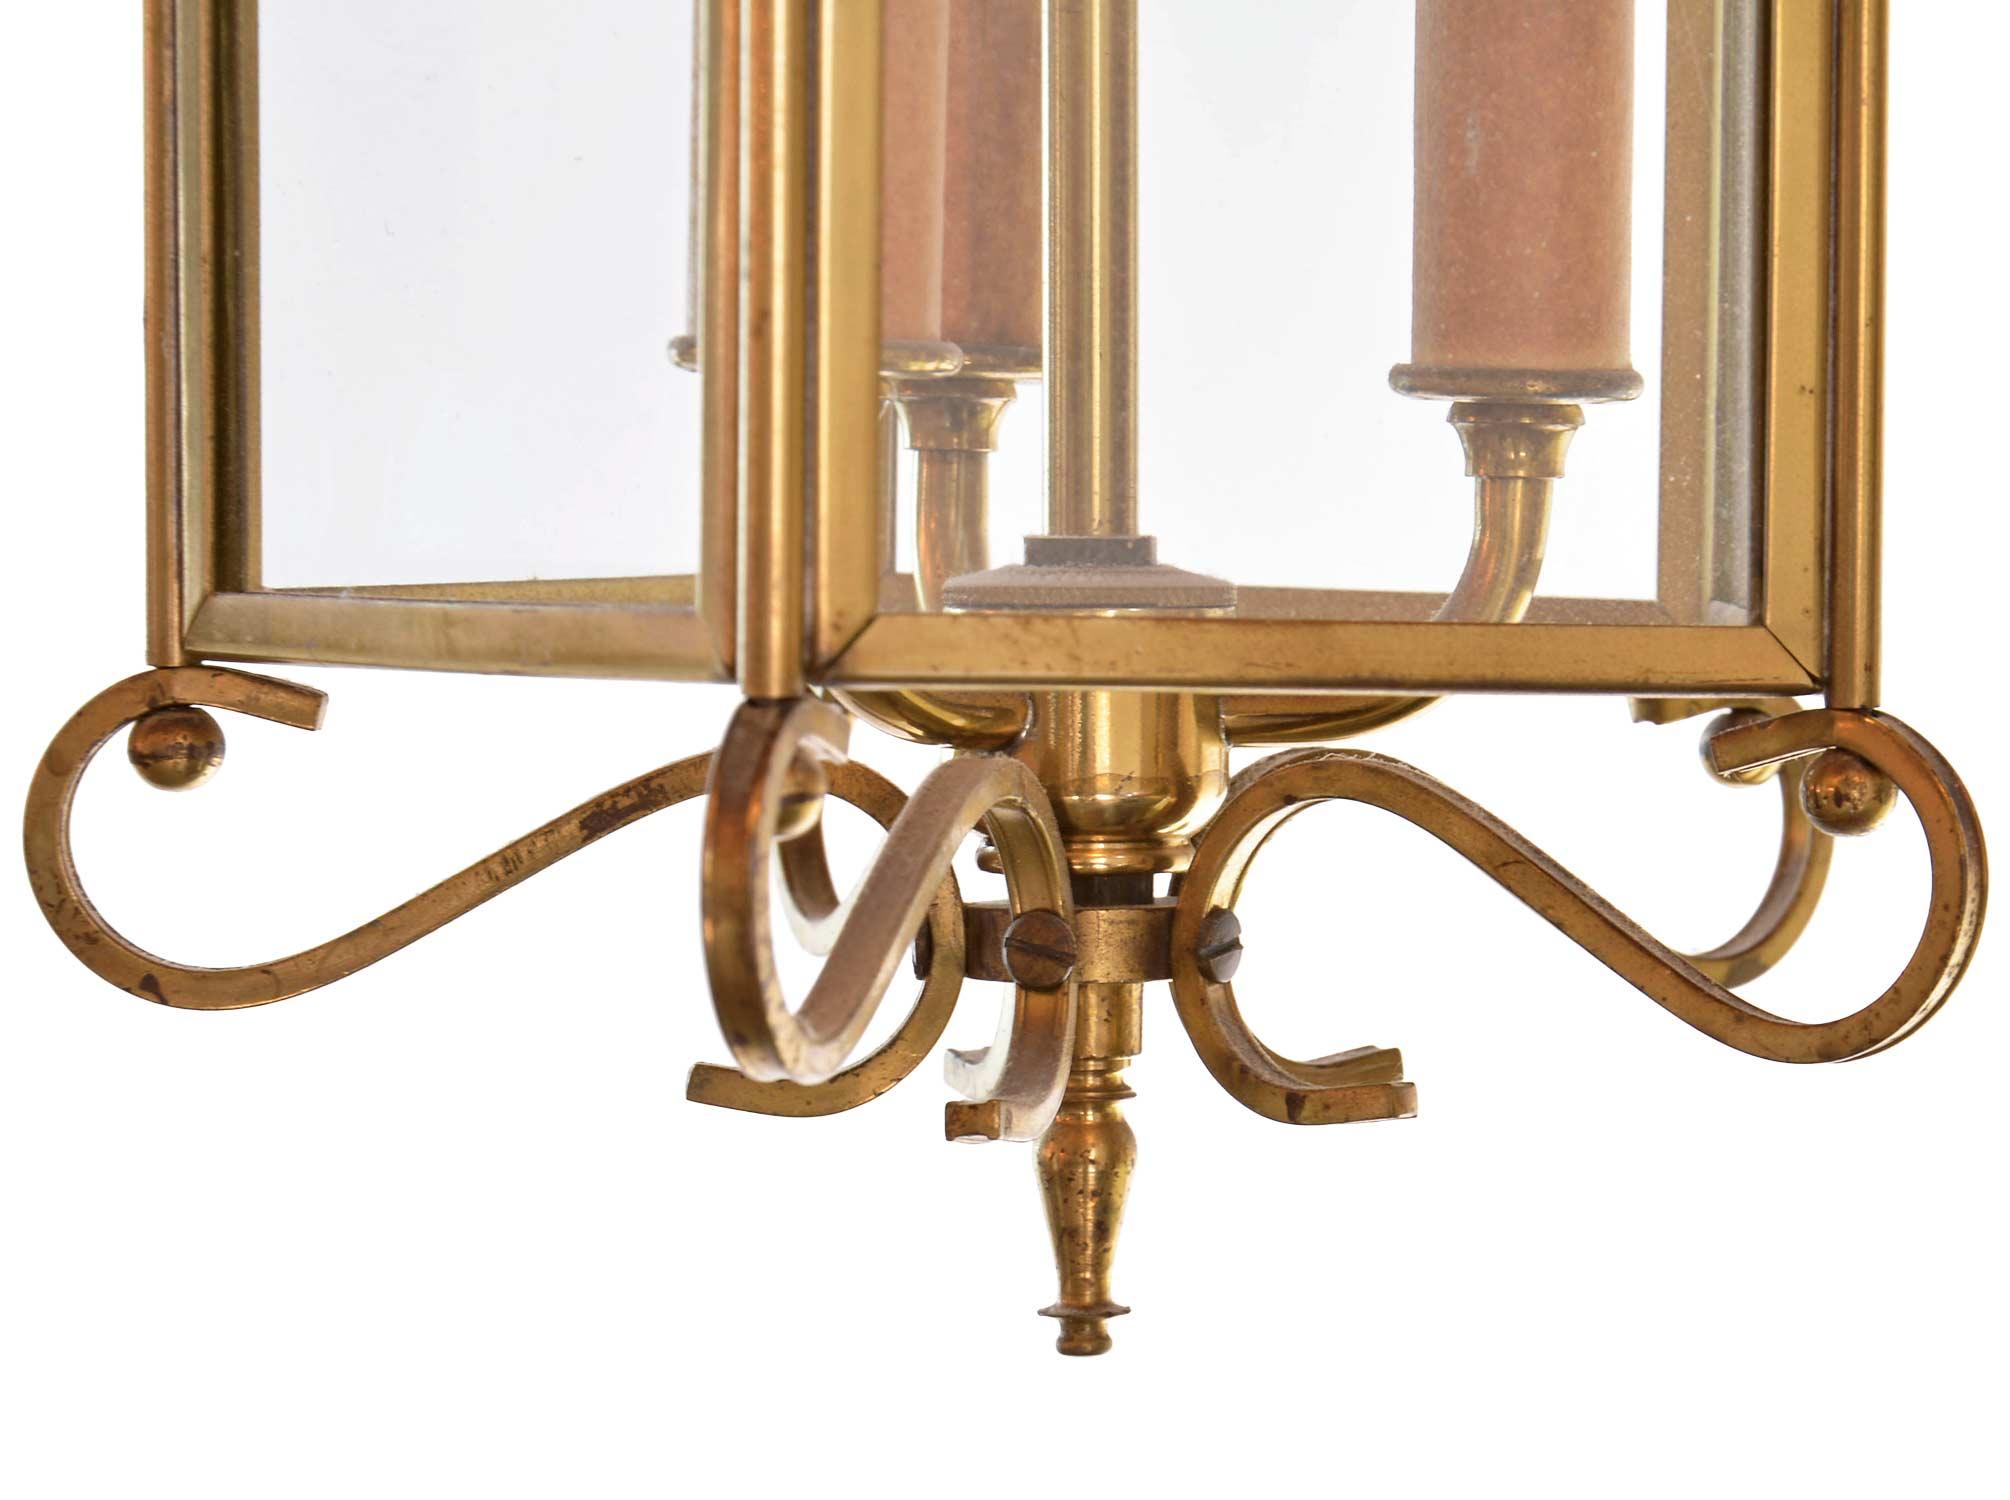 46061-five-etched-glass-panel-brass-foyer-pendant-bottom.jpg